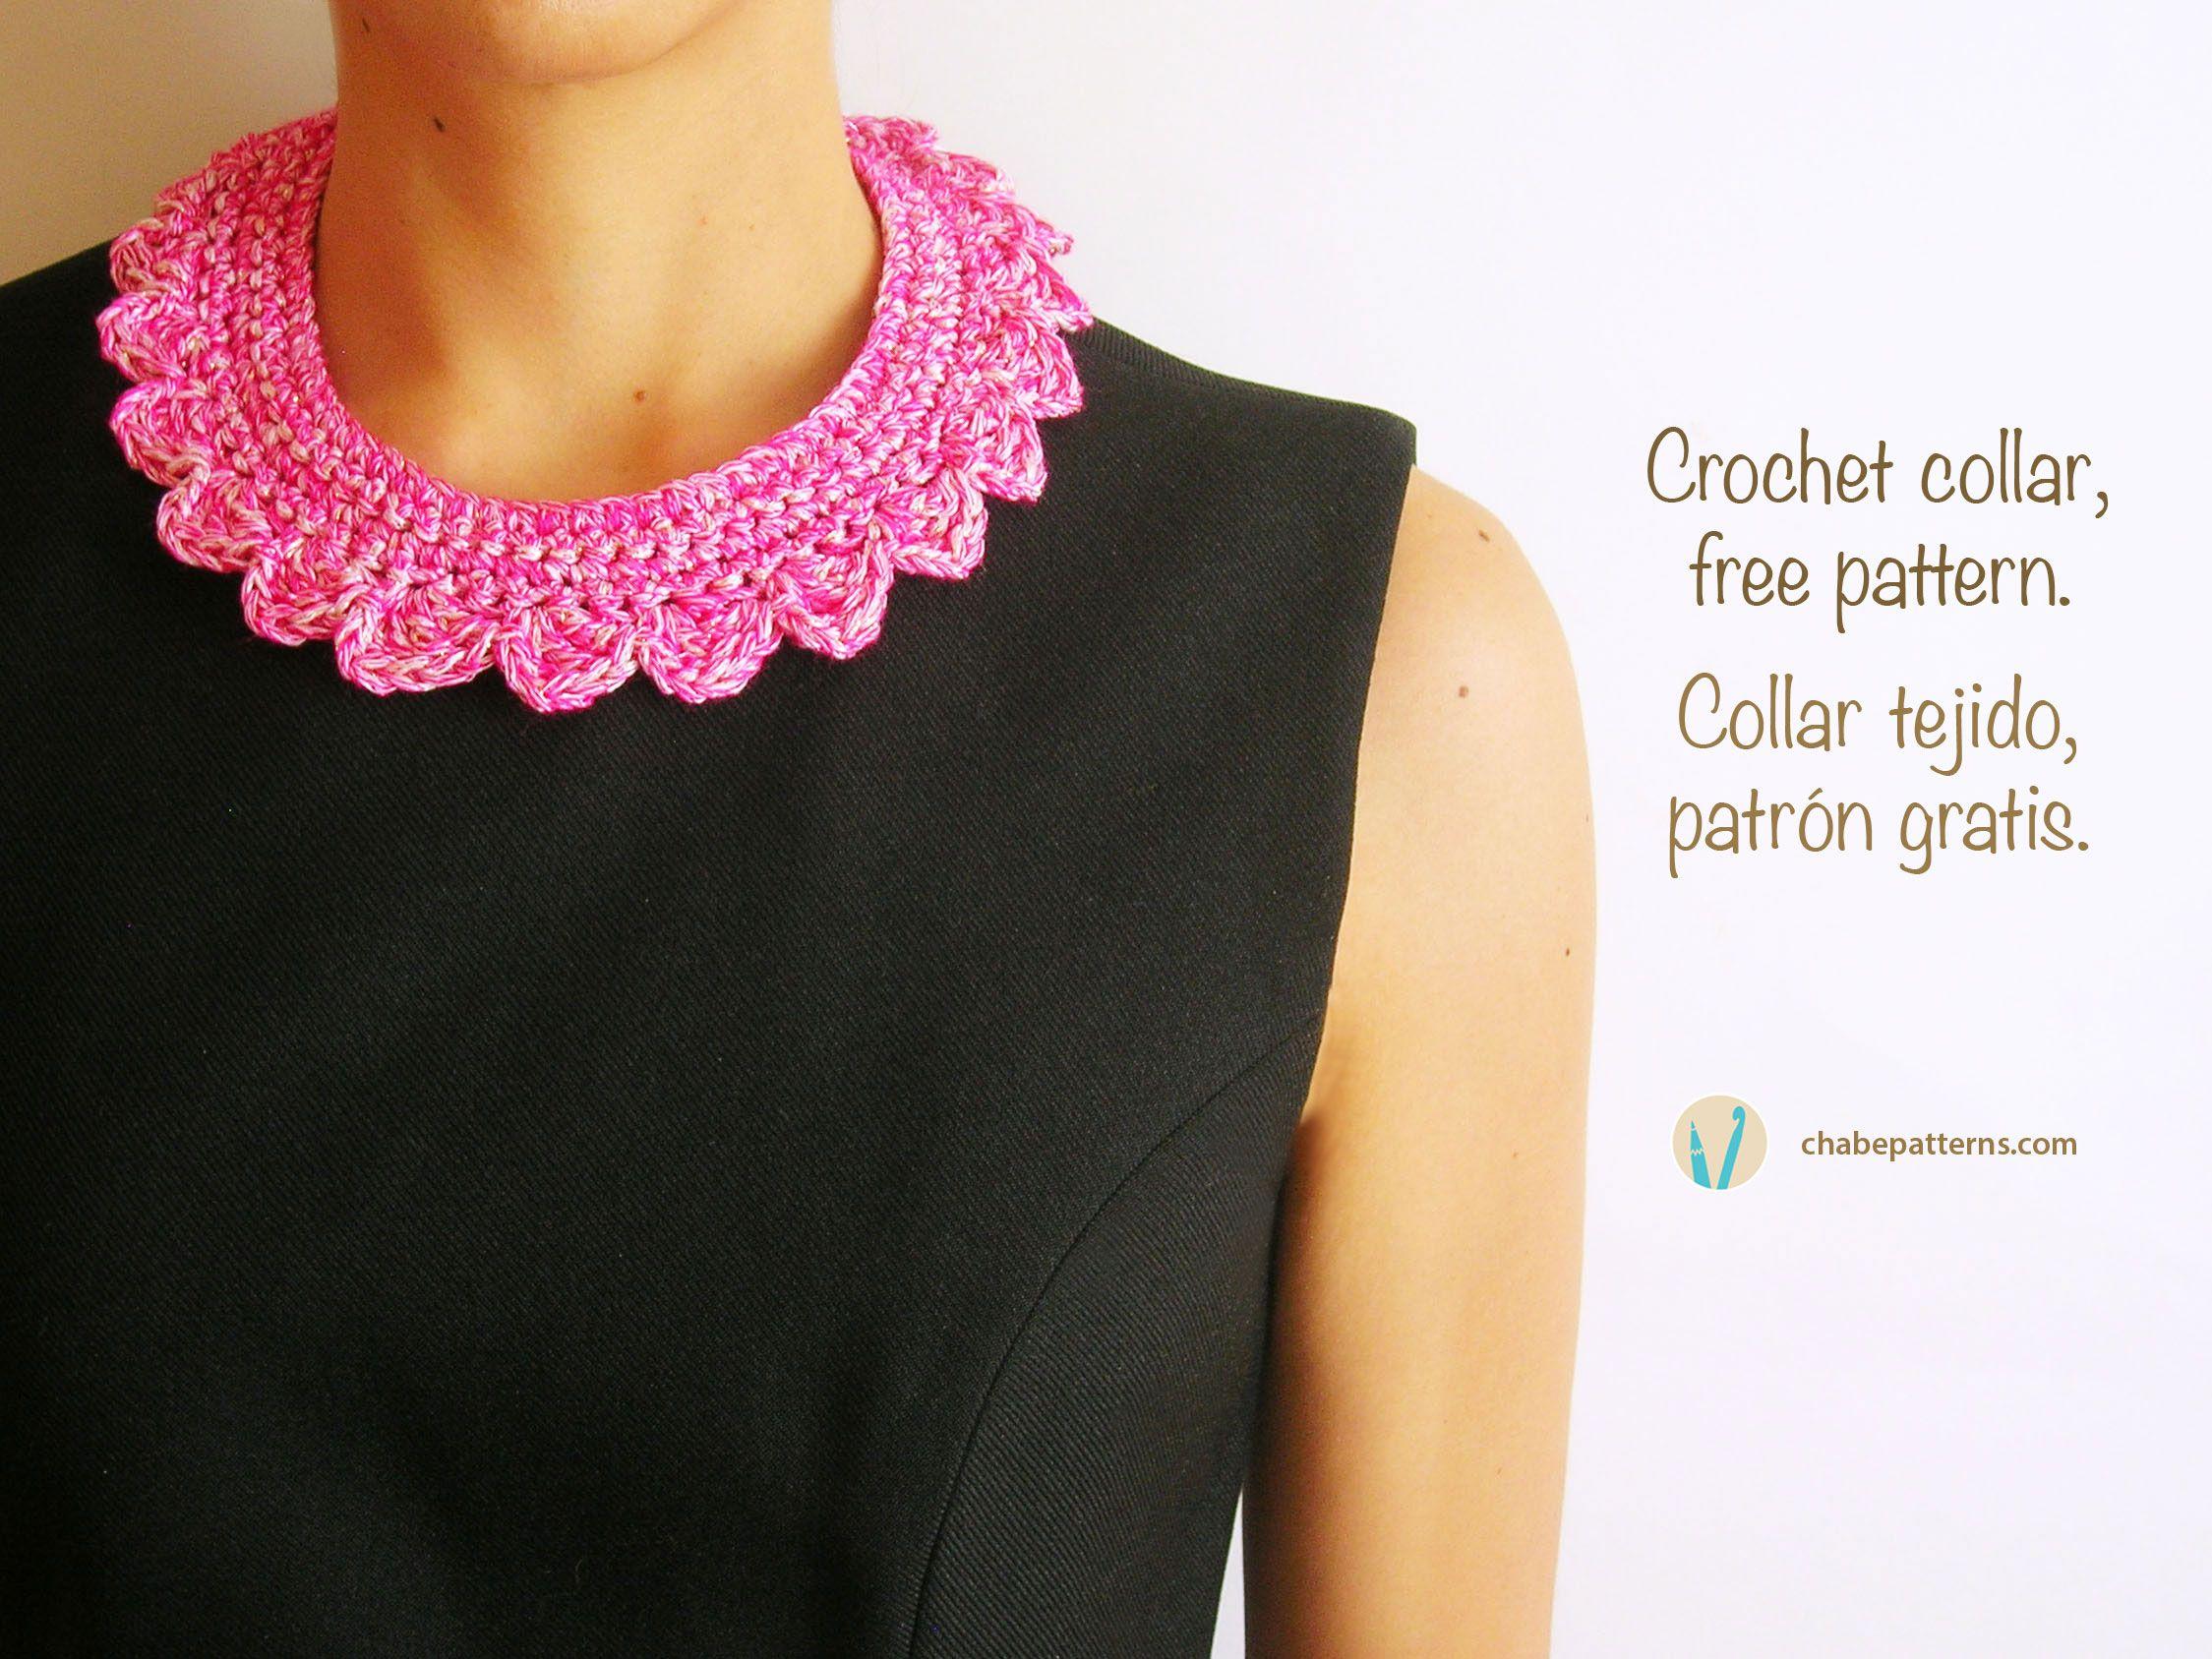 Crochet collar/ Collar tejido | Chabepatterns | Colares ganchillo en ...